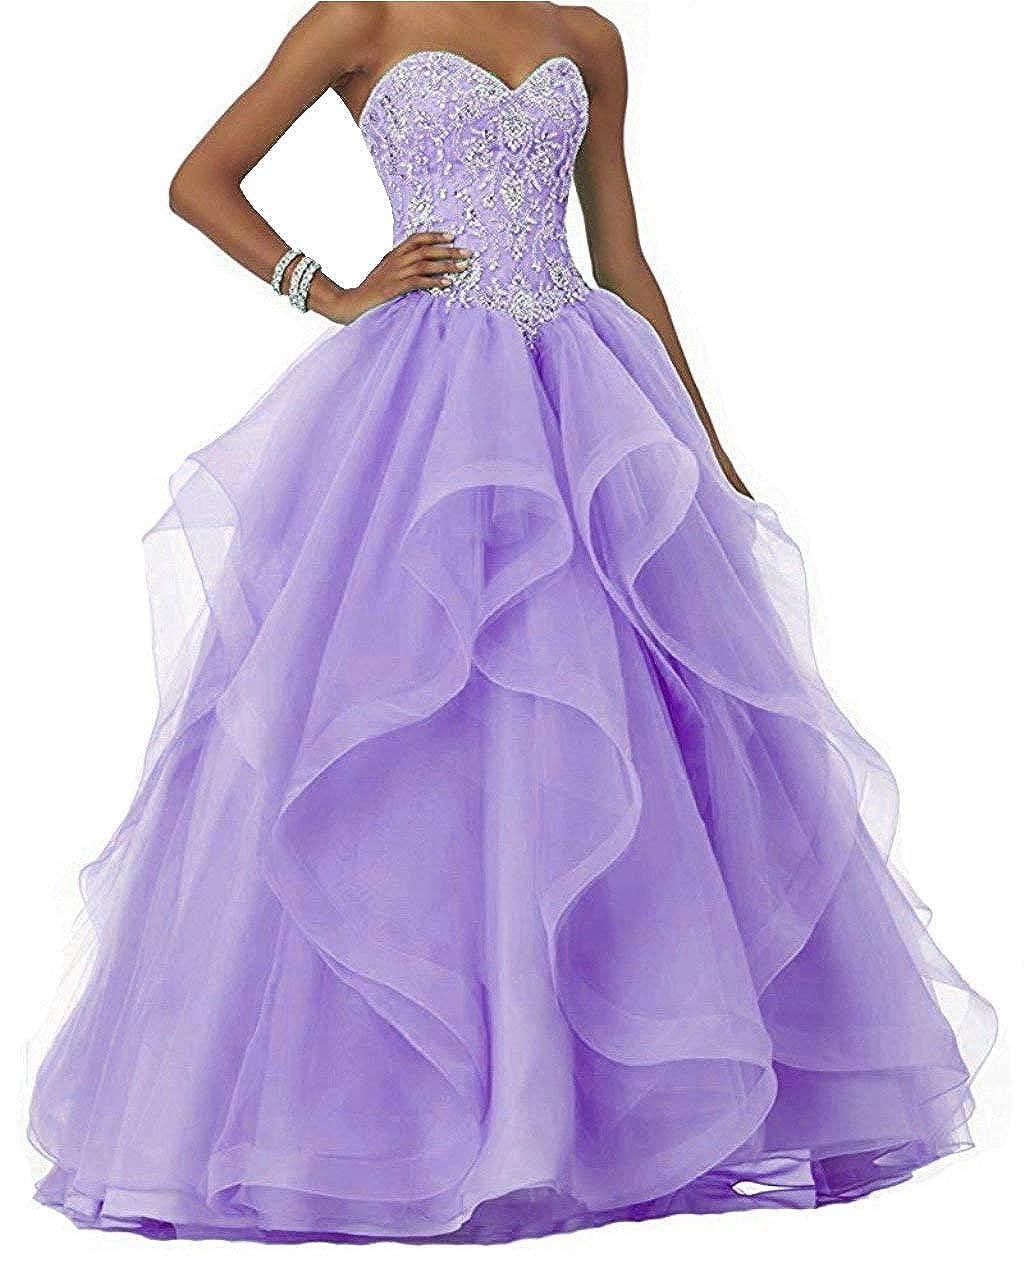 Lavender Vantexi Women's Ruffled Organza Sweet 16 Gown Beaded Formal Prom Quinceanera Dresses